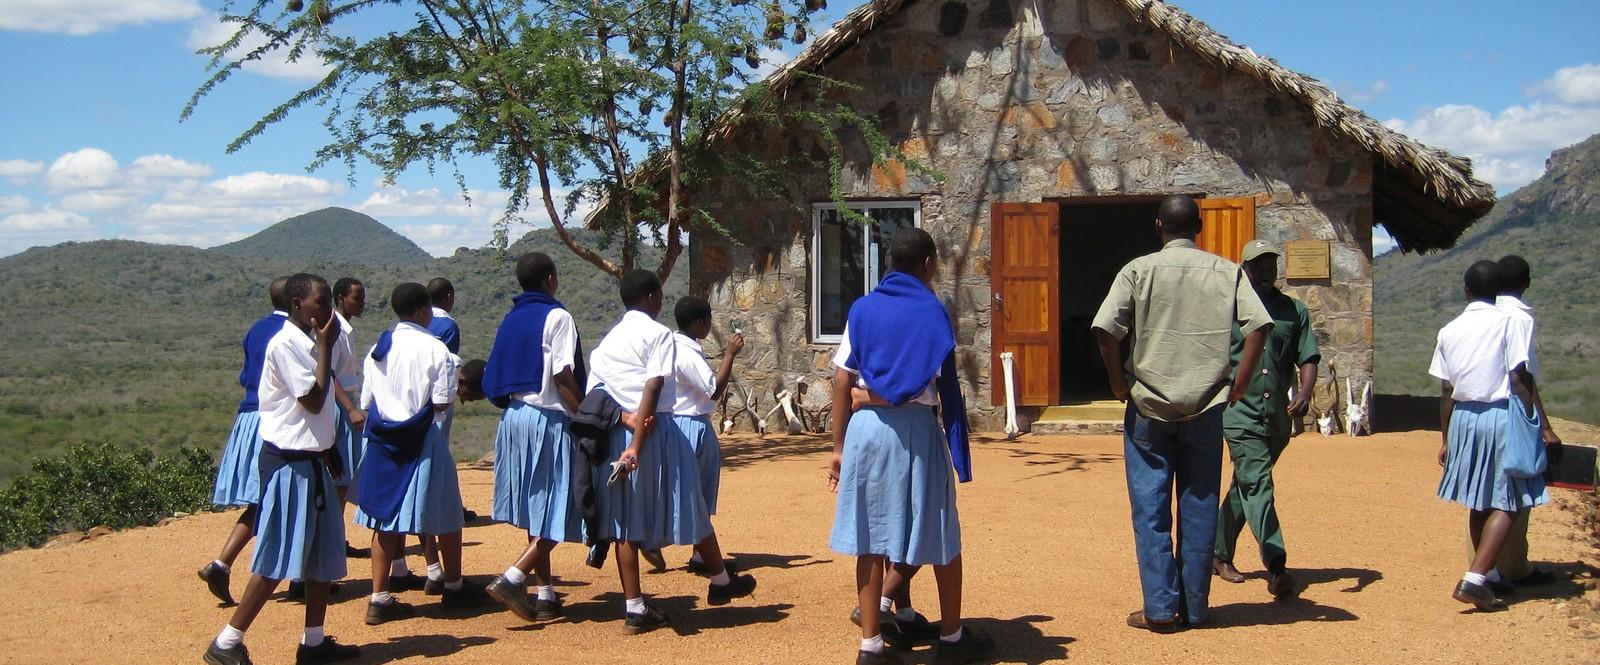 Image of school children on their trip to Mkomazi Rhino Sanctuary in Tanzania